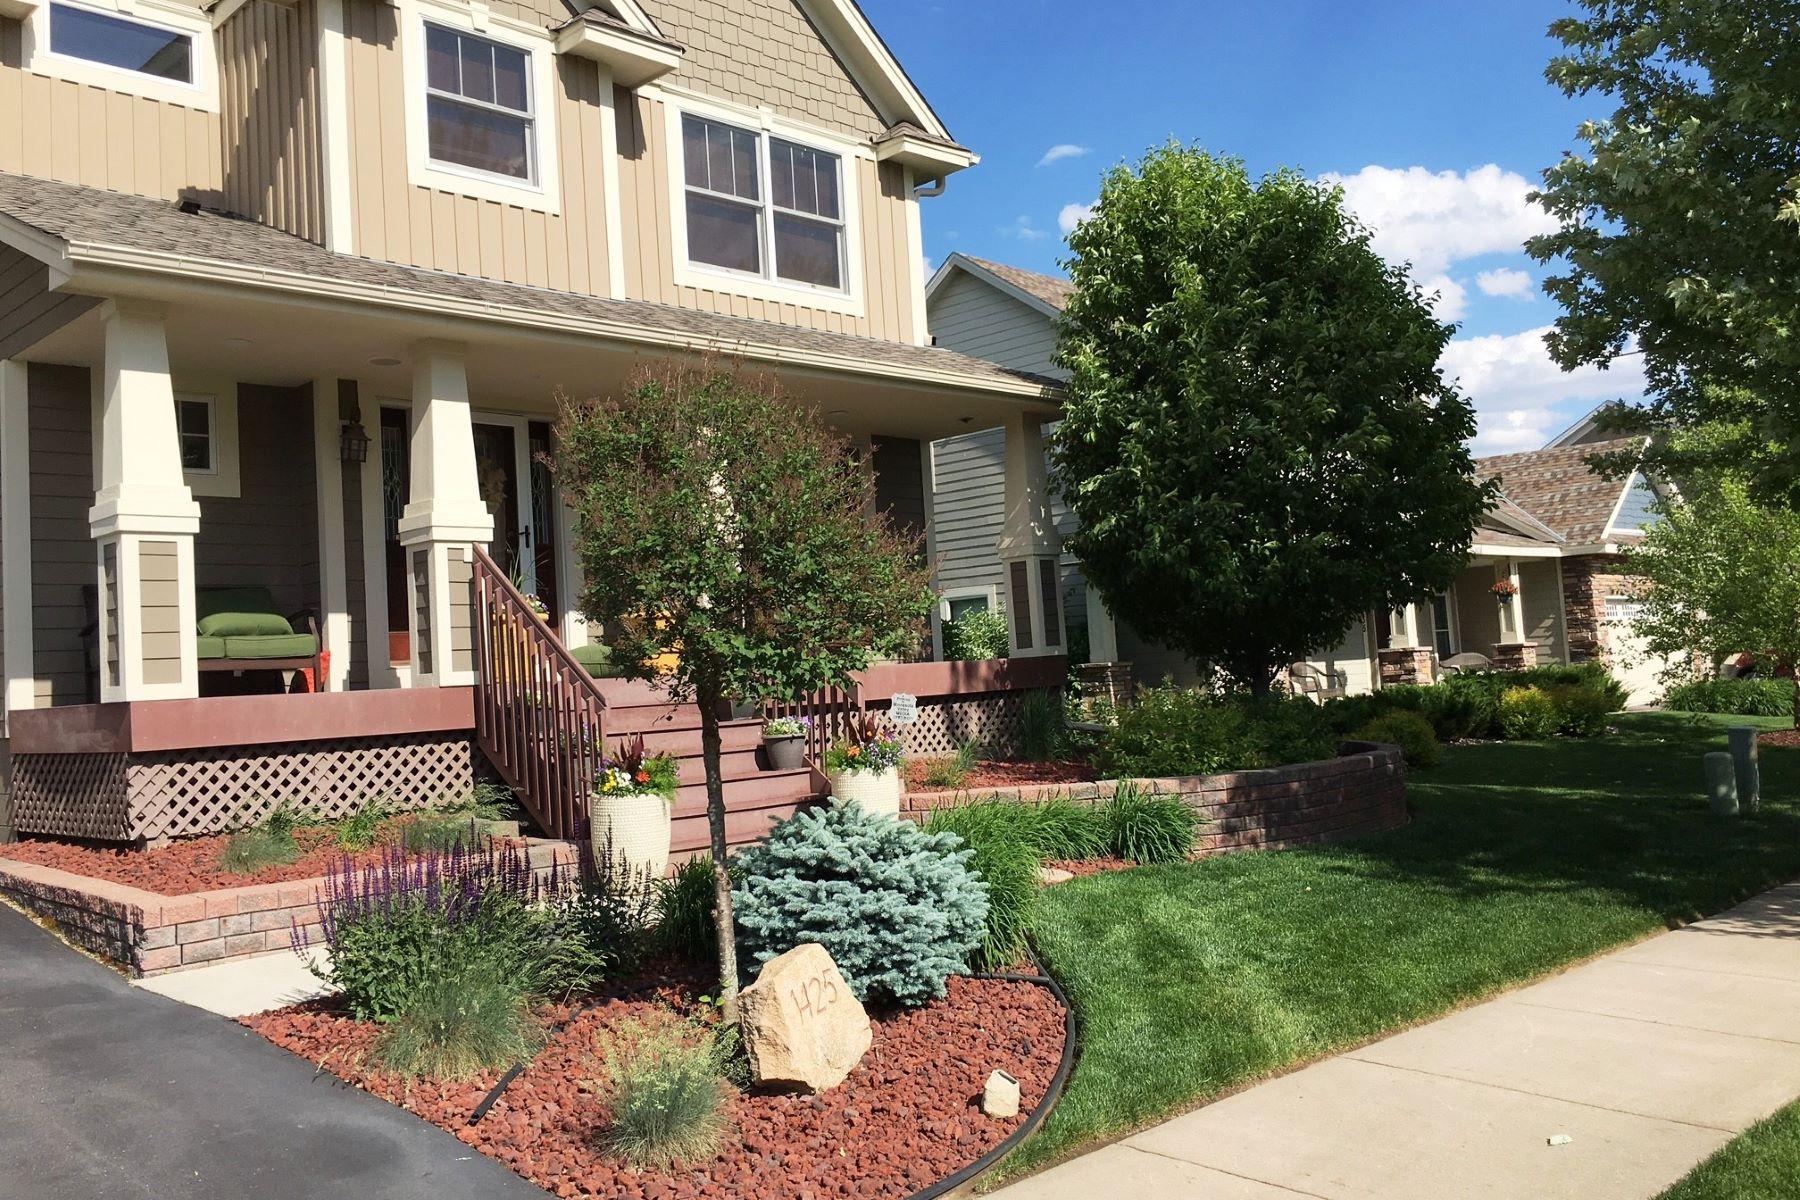 Villa per Vendita alle ore 1425 Whistler Point Road Woodbury, Minnesota, 55129 Stati Uniti